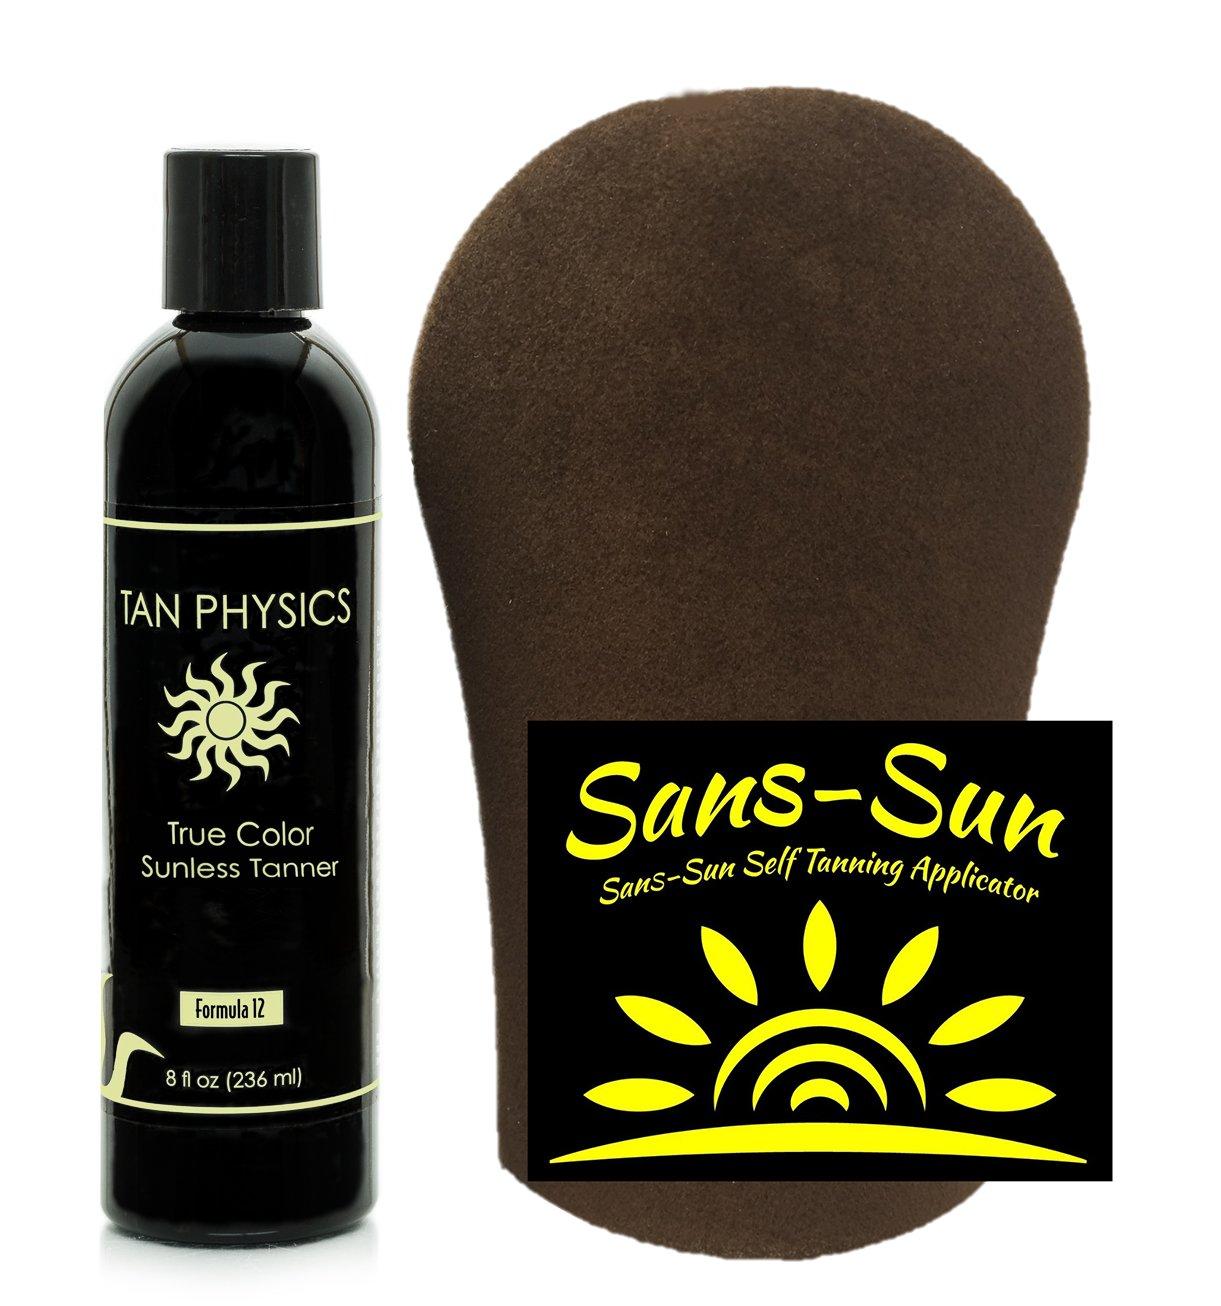 Tan Physics True Color Tanner 8 oz w/FREE Tanning Mitt by Sans-Sun